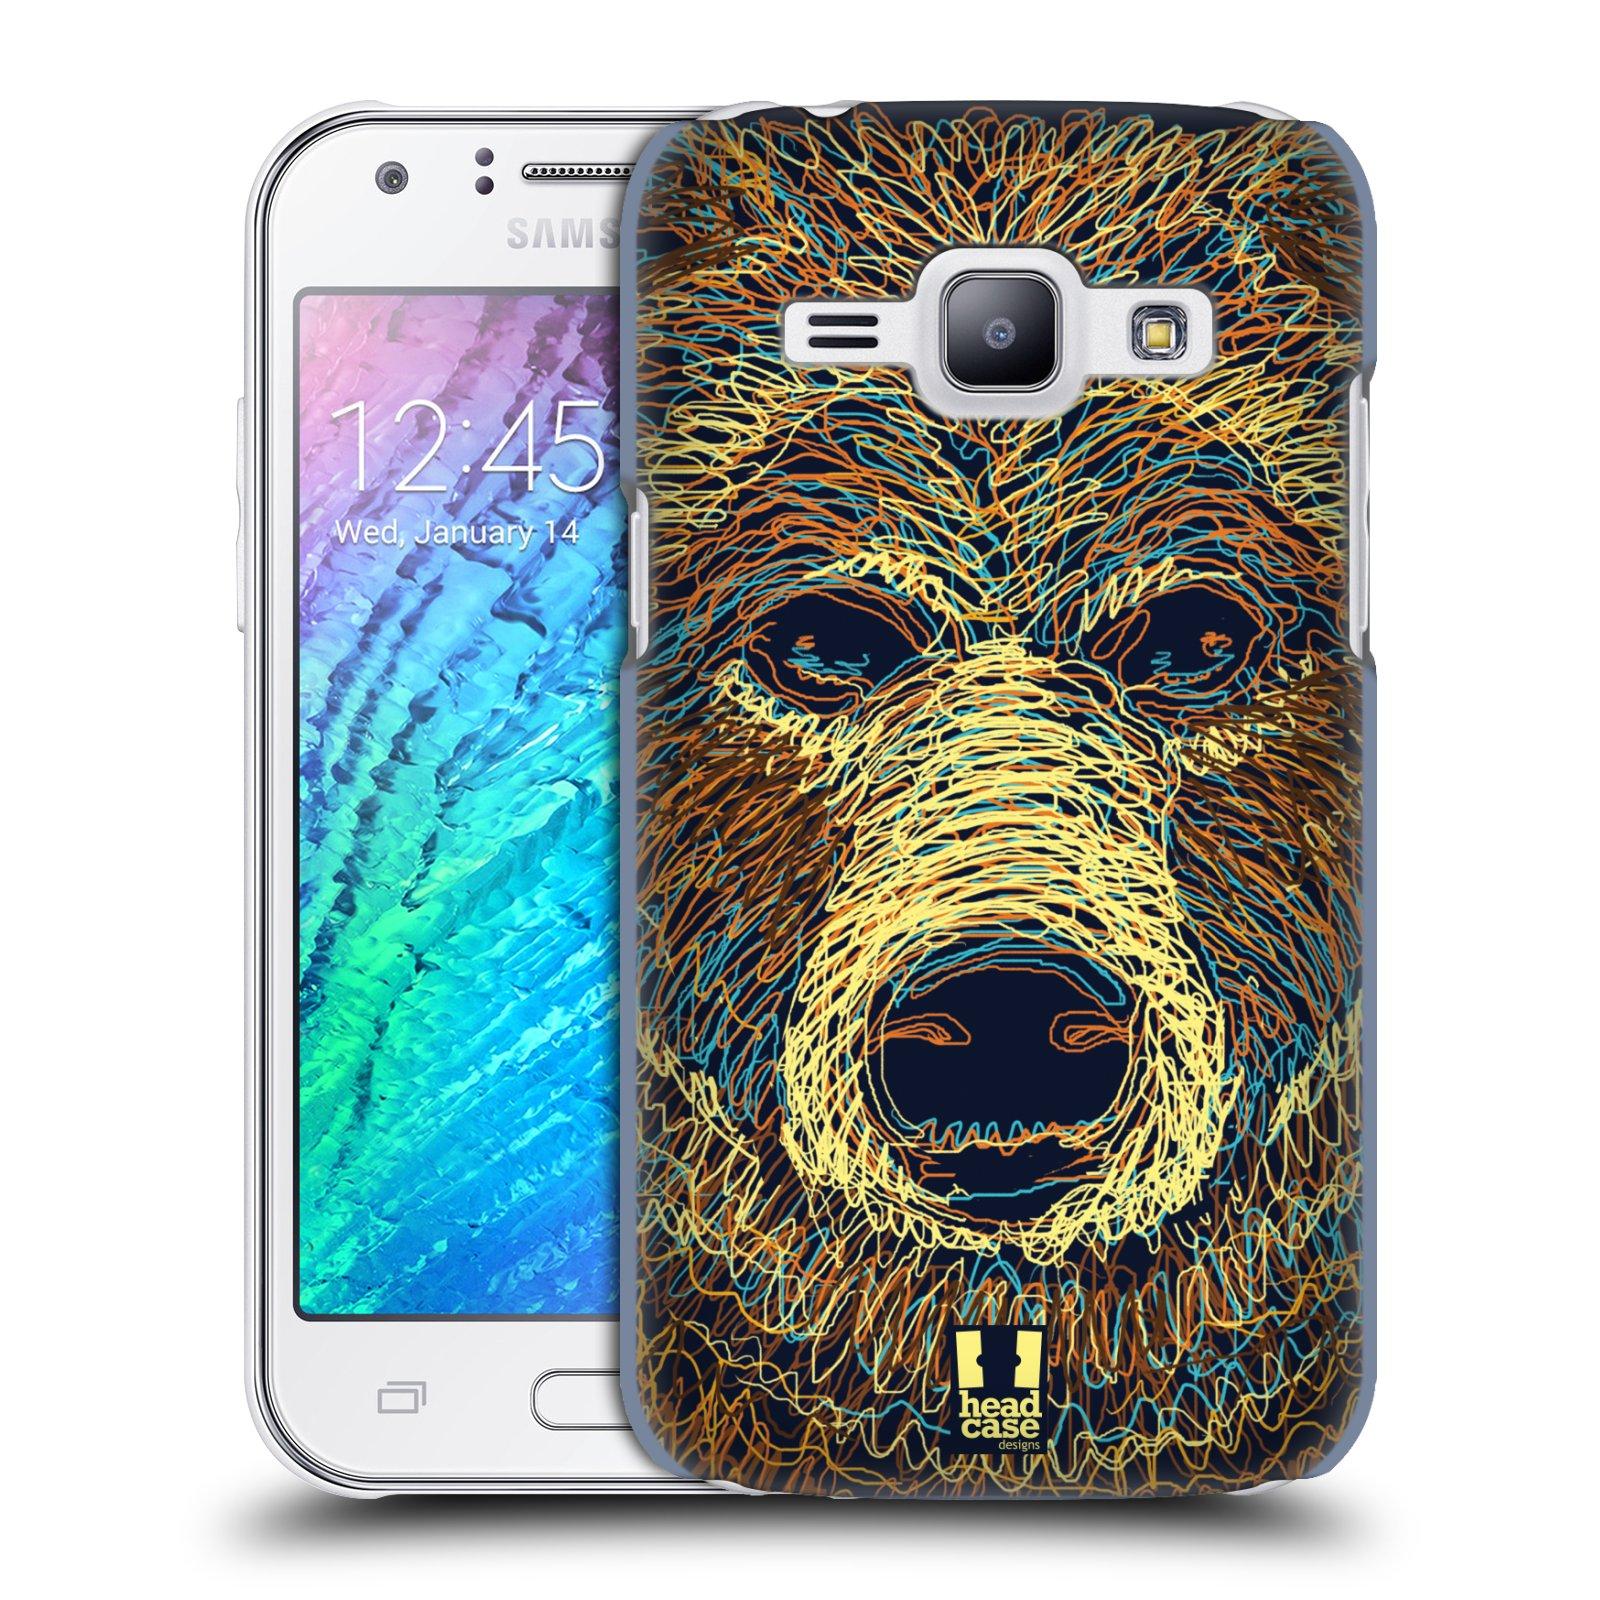 HEAD CASE plastový obal na mobil SAMSUNG Galaxy J1, J100 vzor zvíře čmáranice medvěd